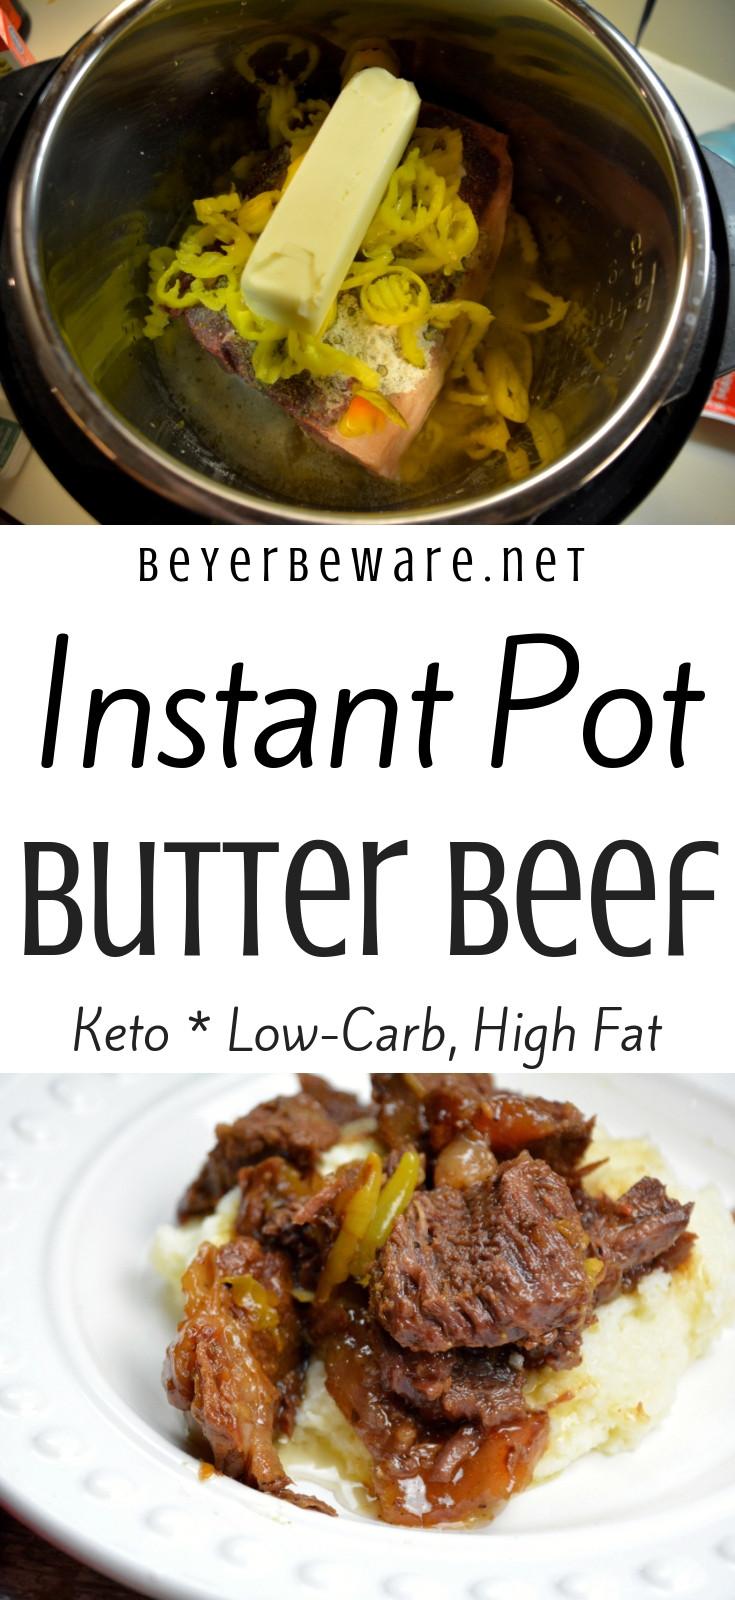 Instant Pot Beef Keto  Instant Pot Butter Beef Keto Low Carb Recipe Beyer Beware